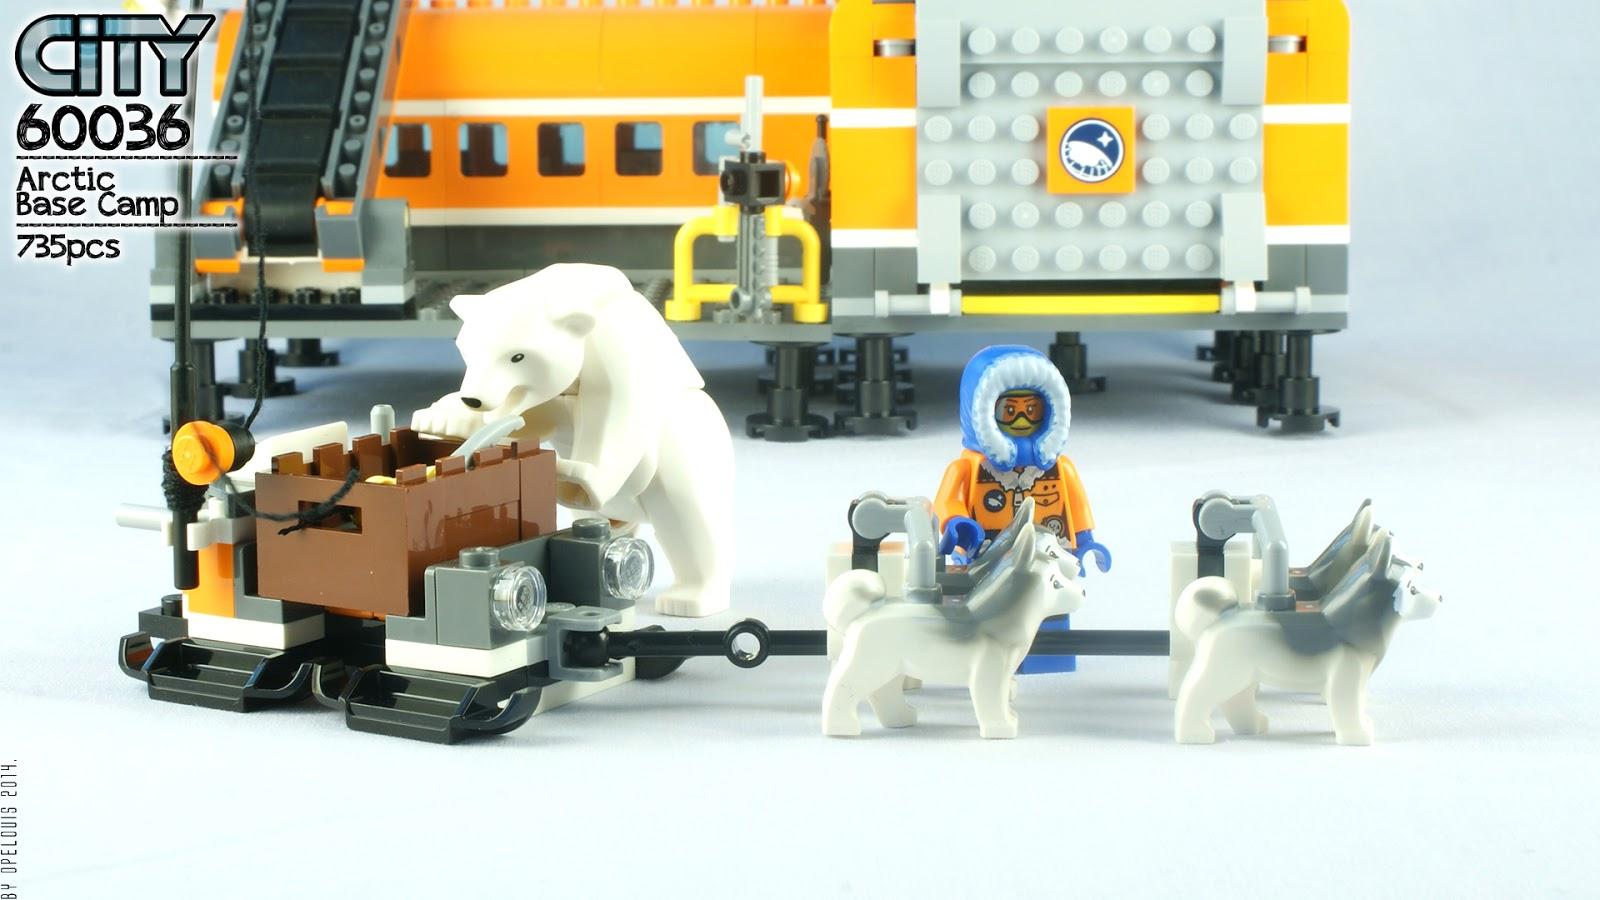 Lego city 60036 arctic base camp part 1